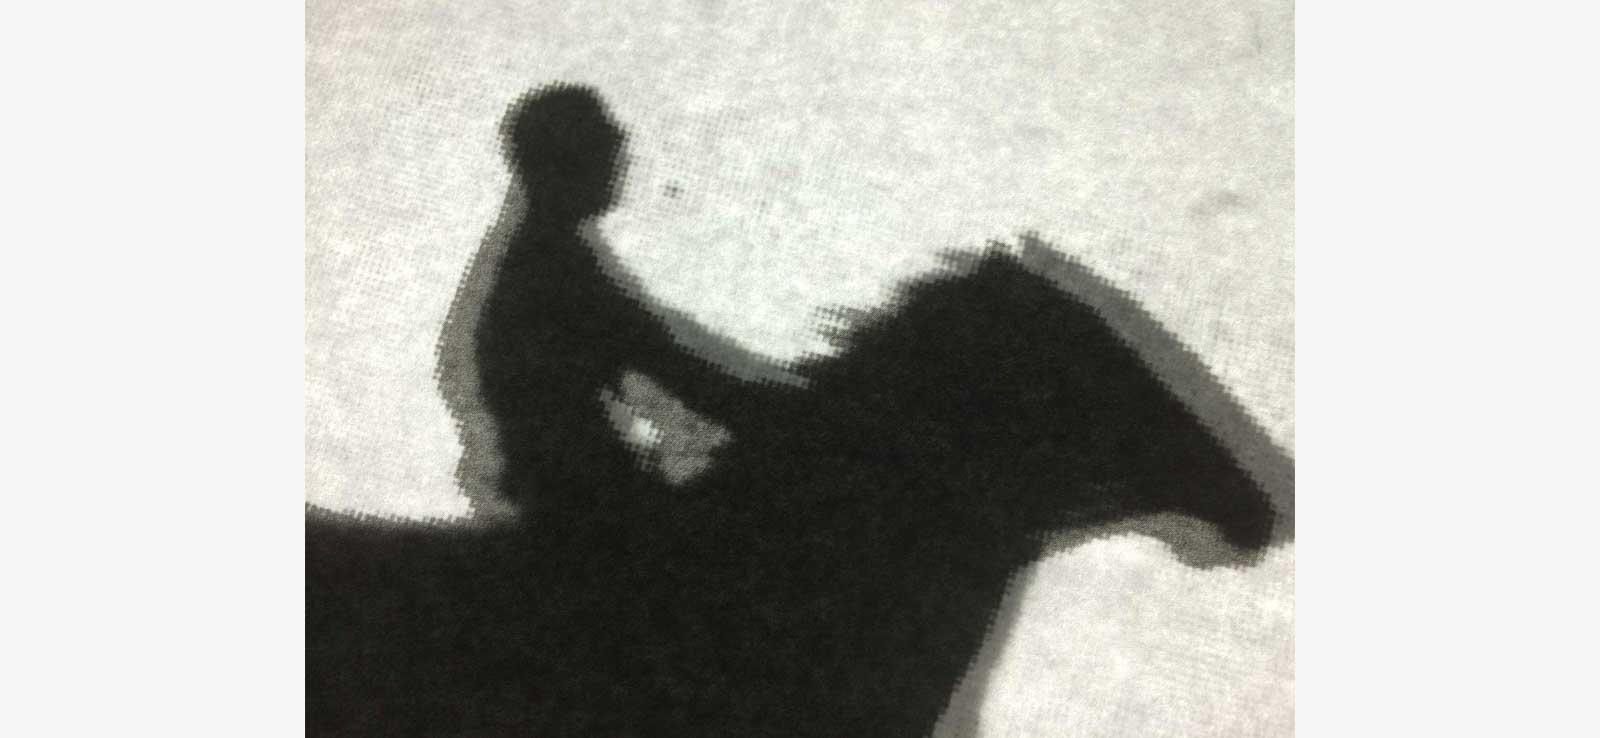 Antoni-Pinent-film-Still-Frame-analog-QR-CODE-16mm-animation-artist